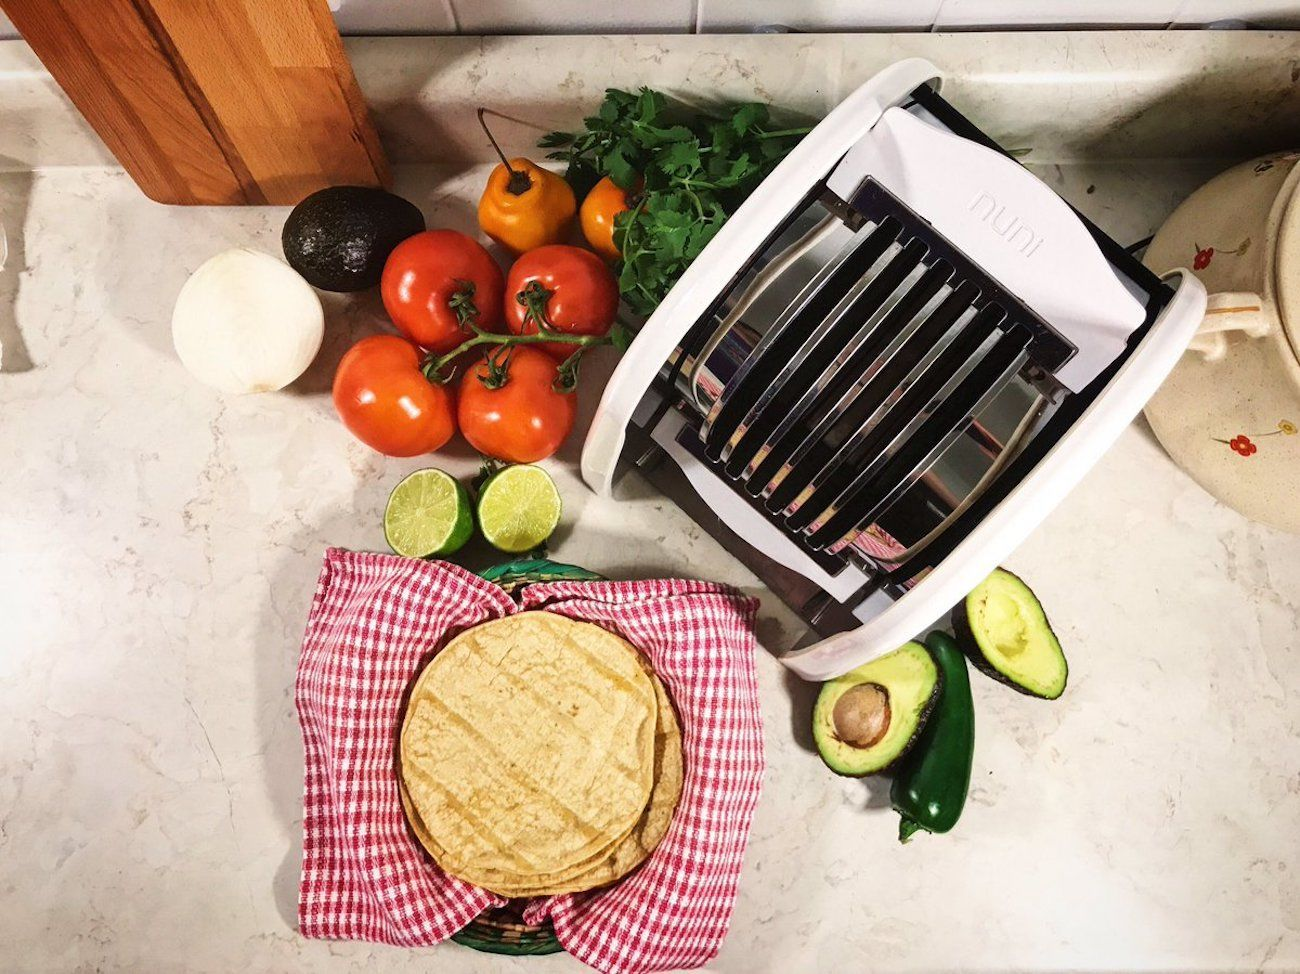 Nuni+6-Slot+Tortilla+Toaster